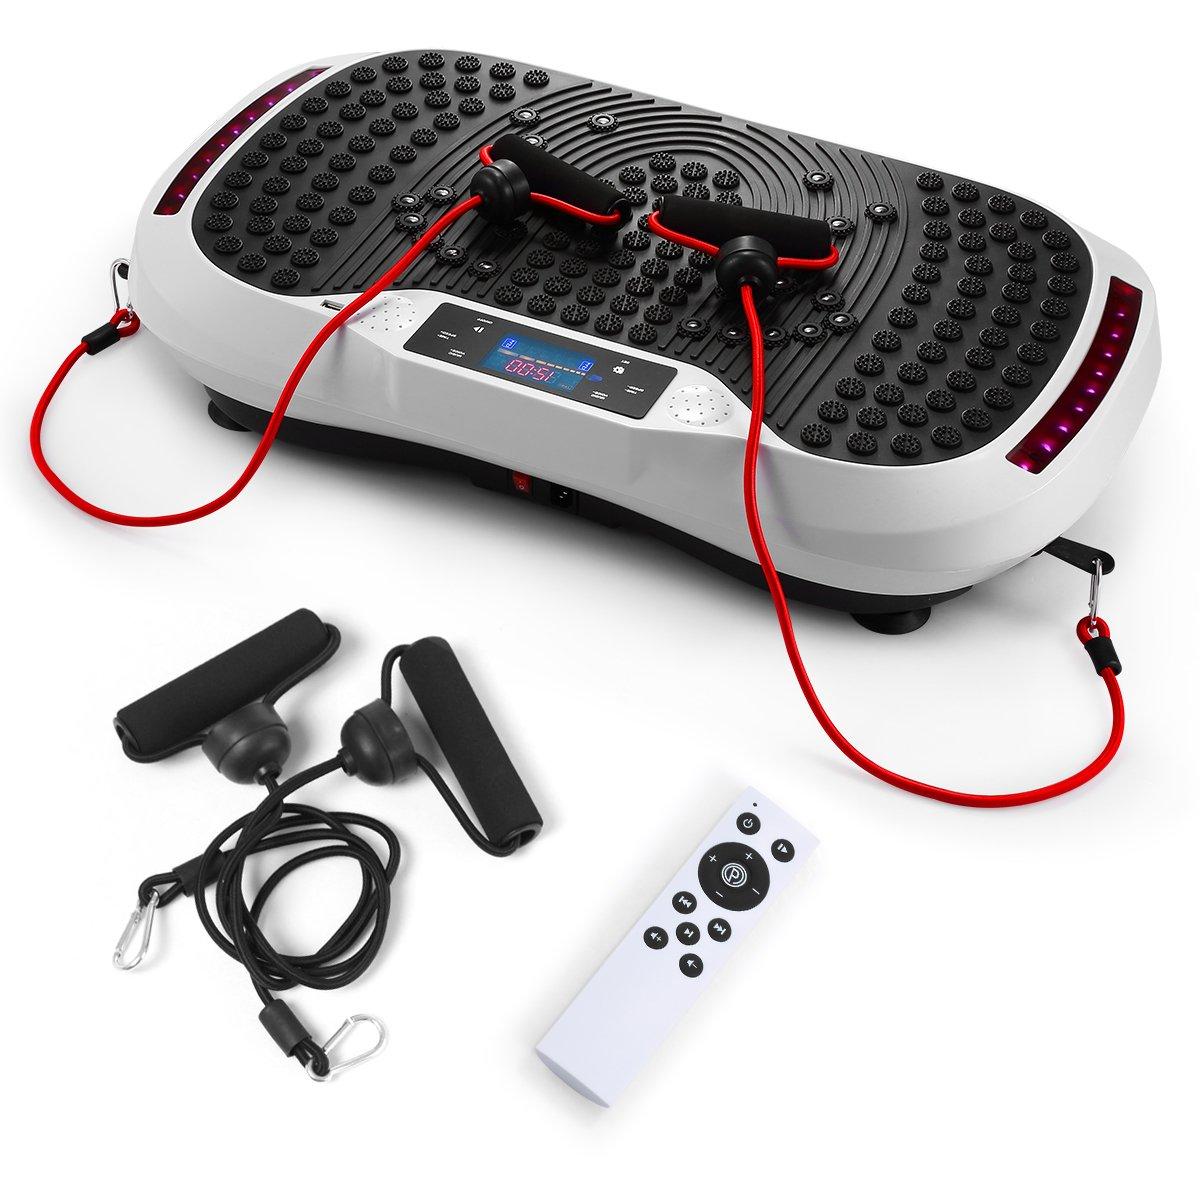 GENKI YD-1015W Vibration Platform Plate Whole Body Massager Machine Slim Exercise Fitness by GENKI (Image #1)